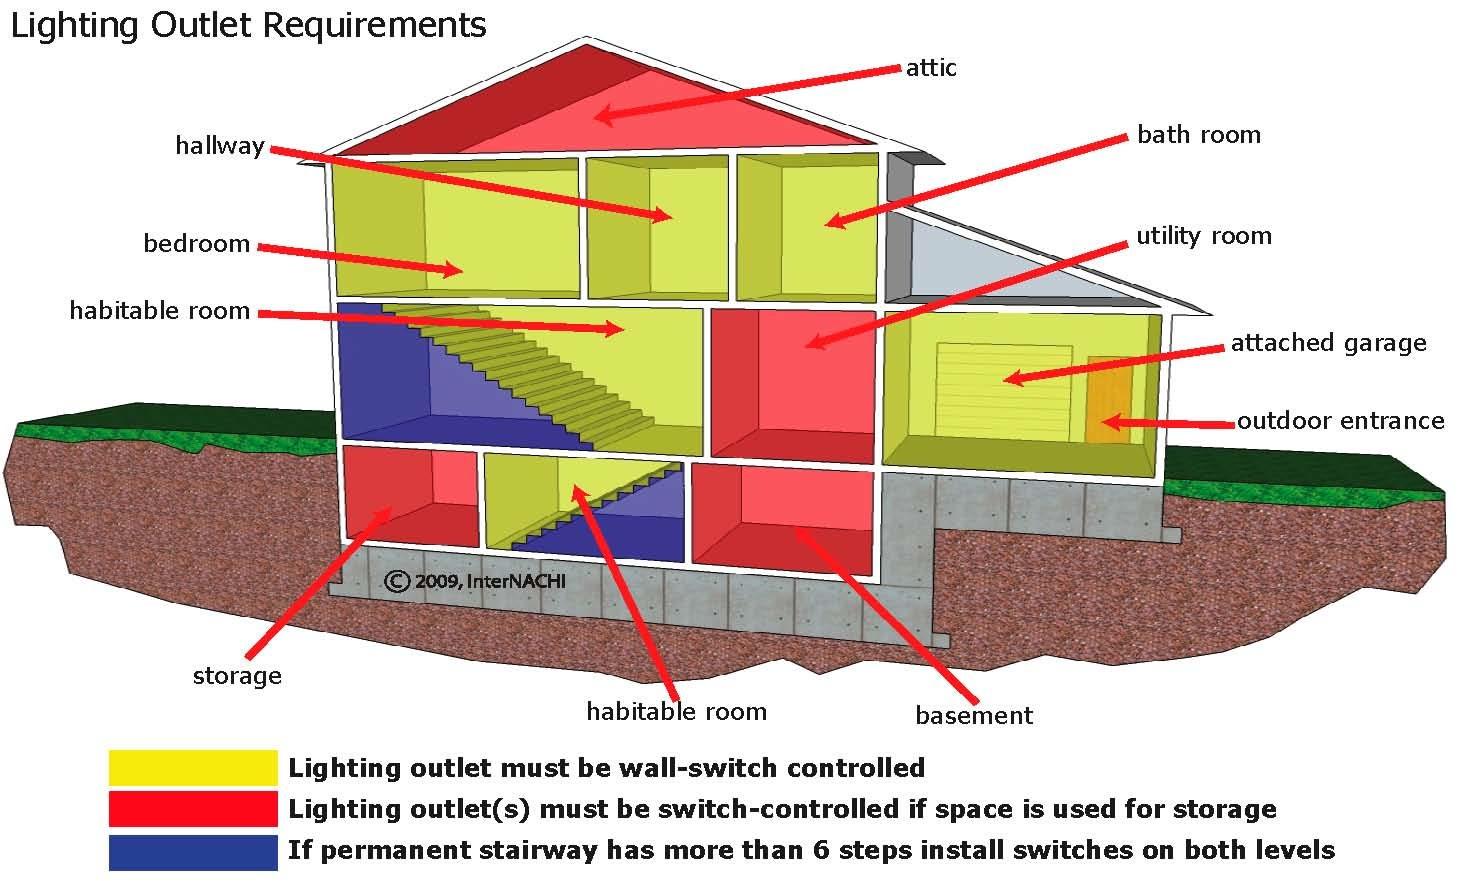 Lighting requirements.